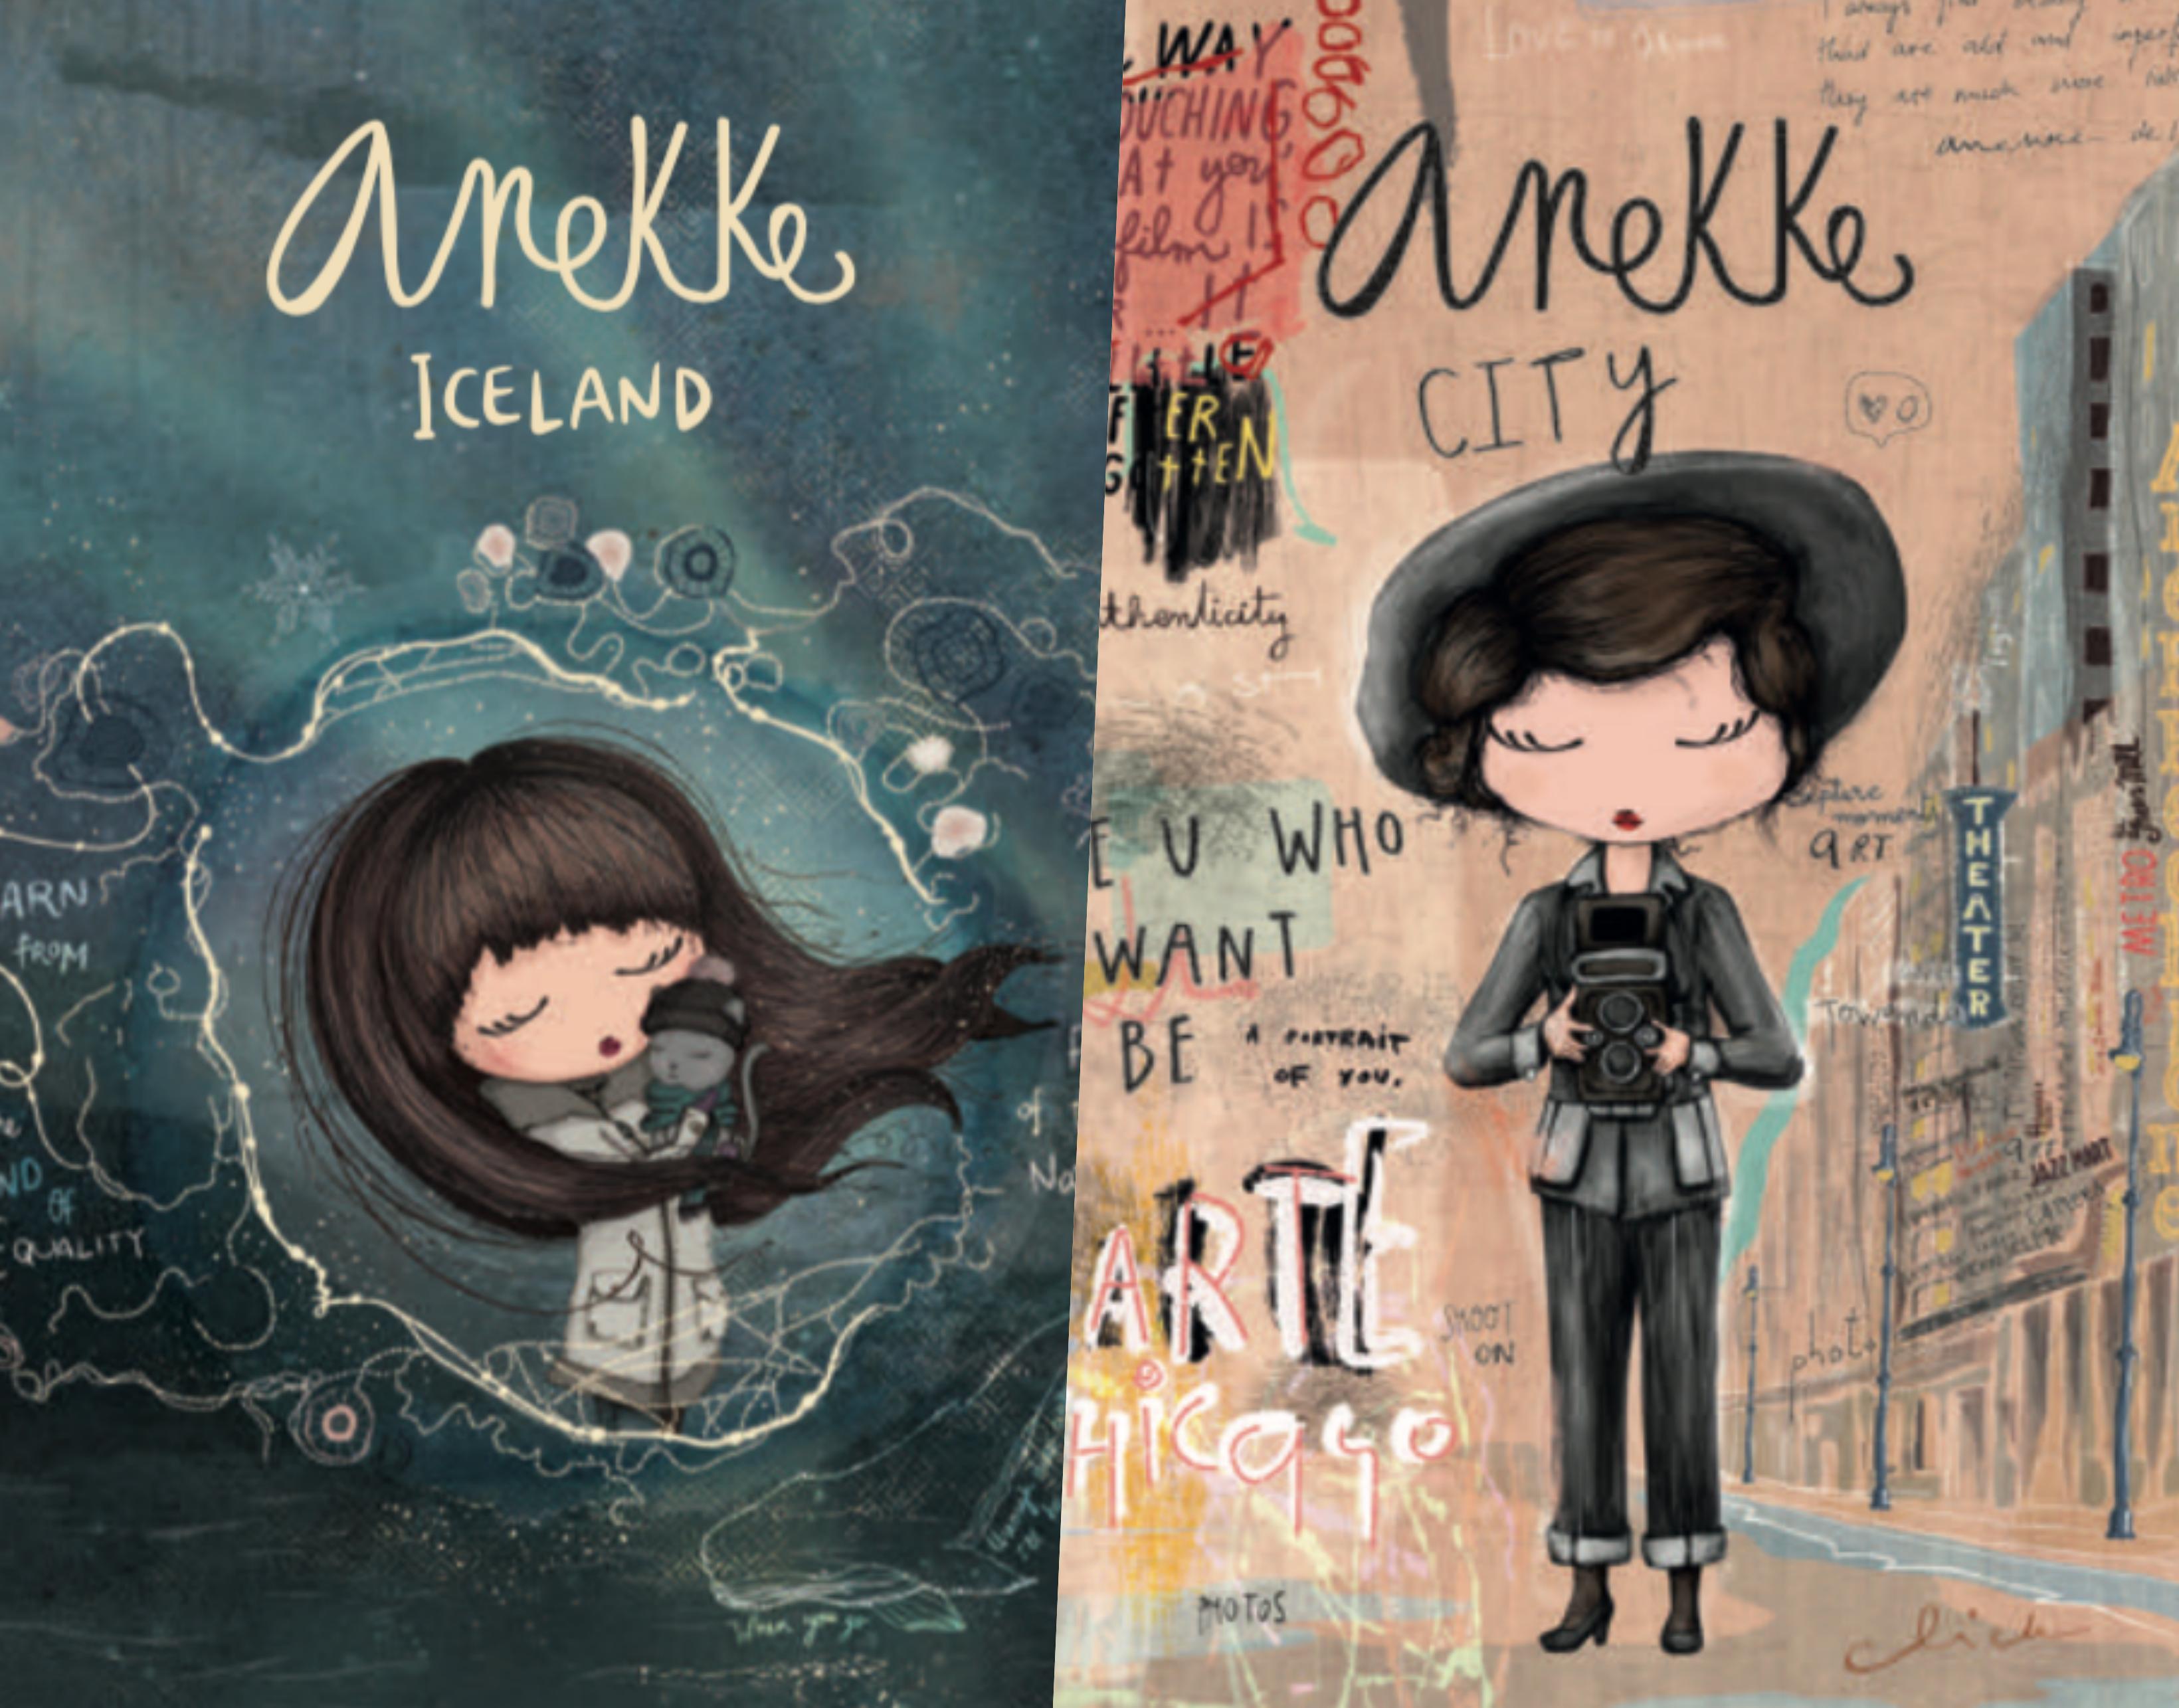 Nová kolekcia jeseň/zima 2021 španielskej značky Anekke